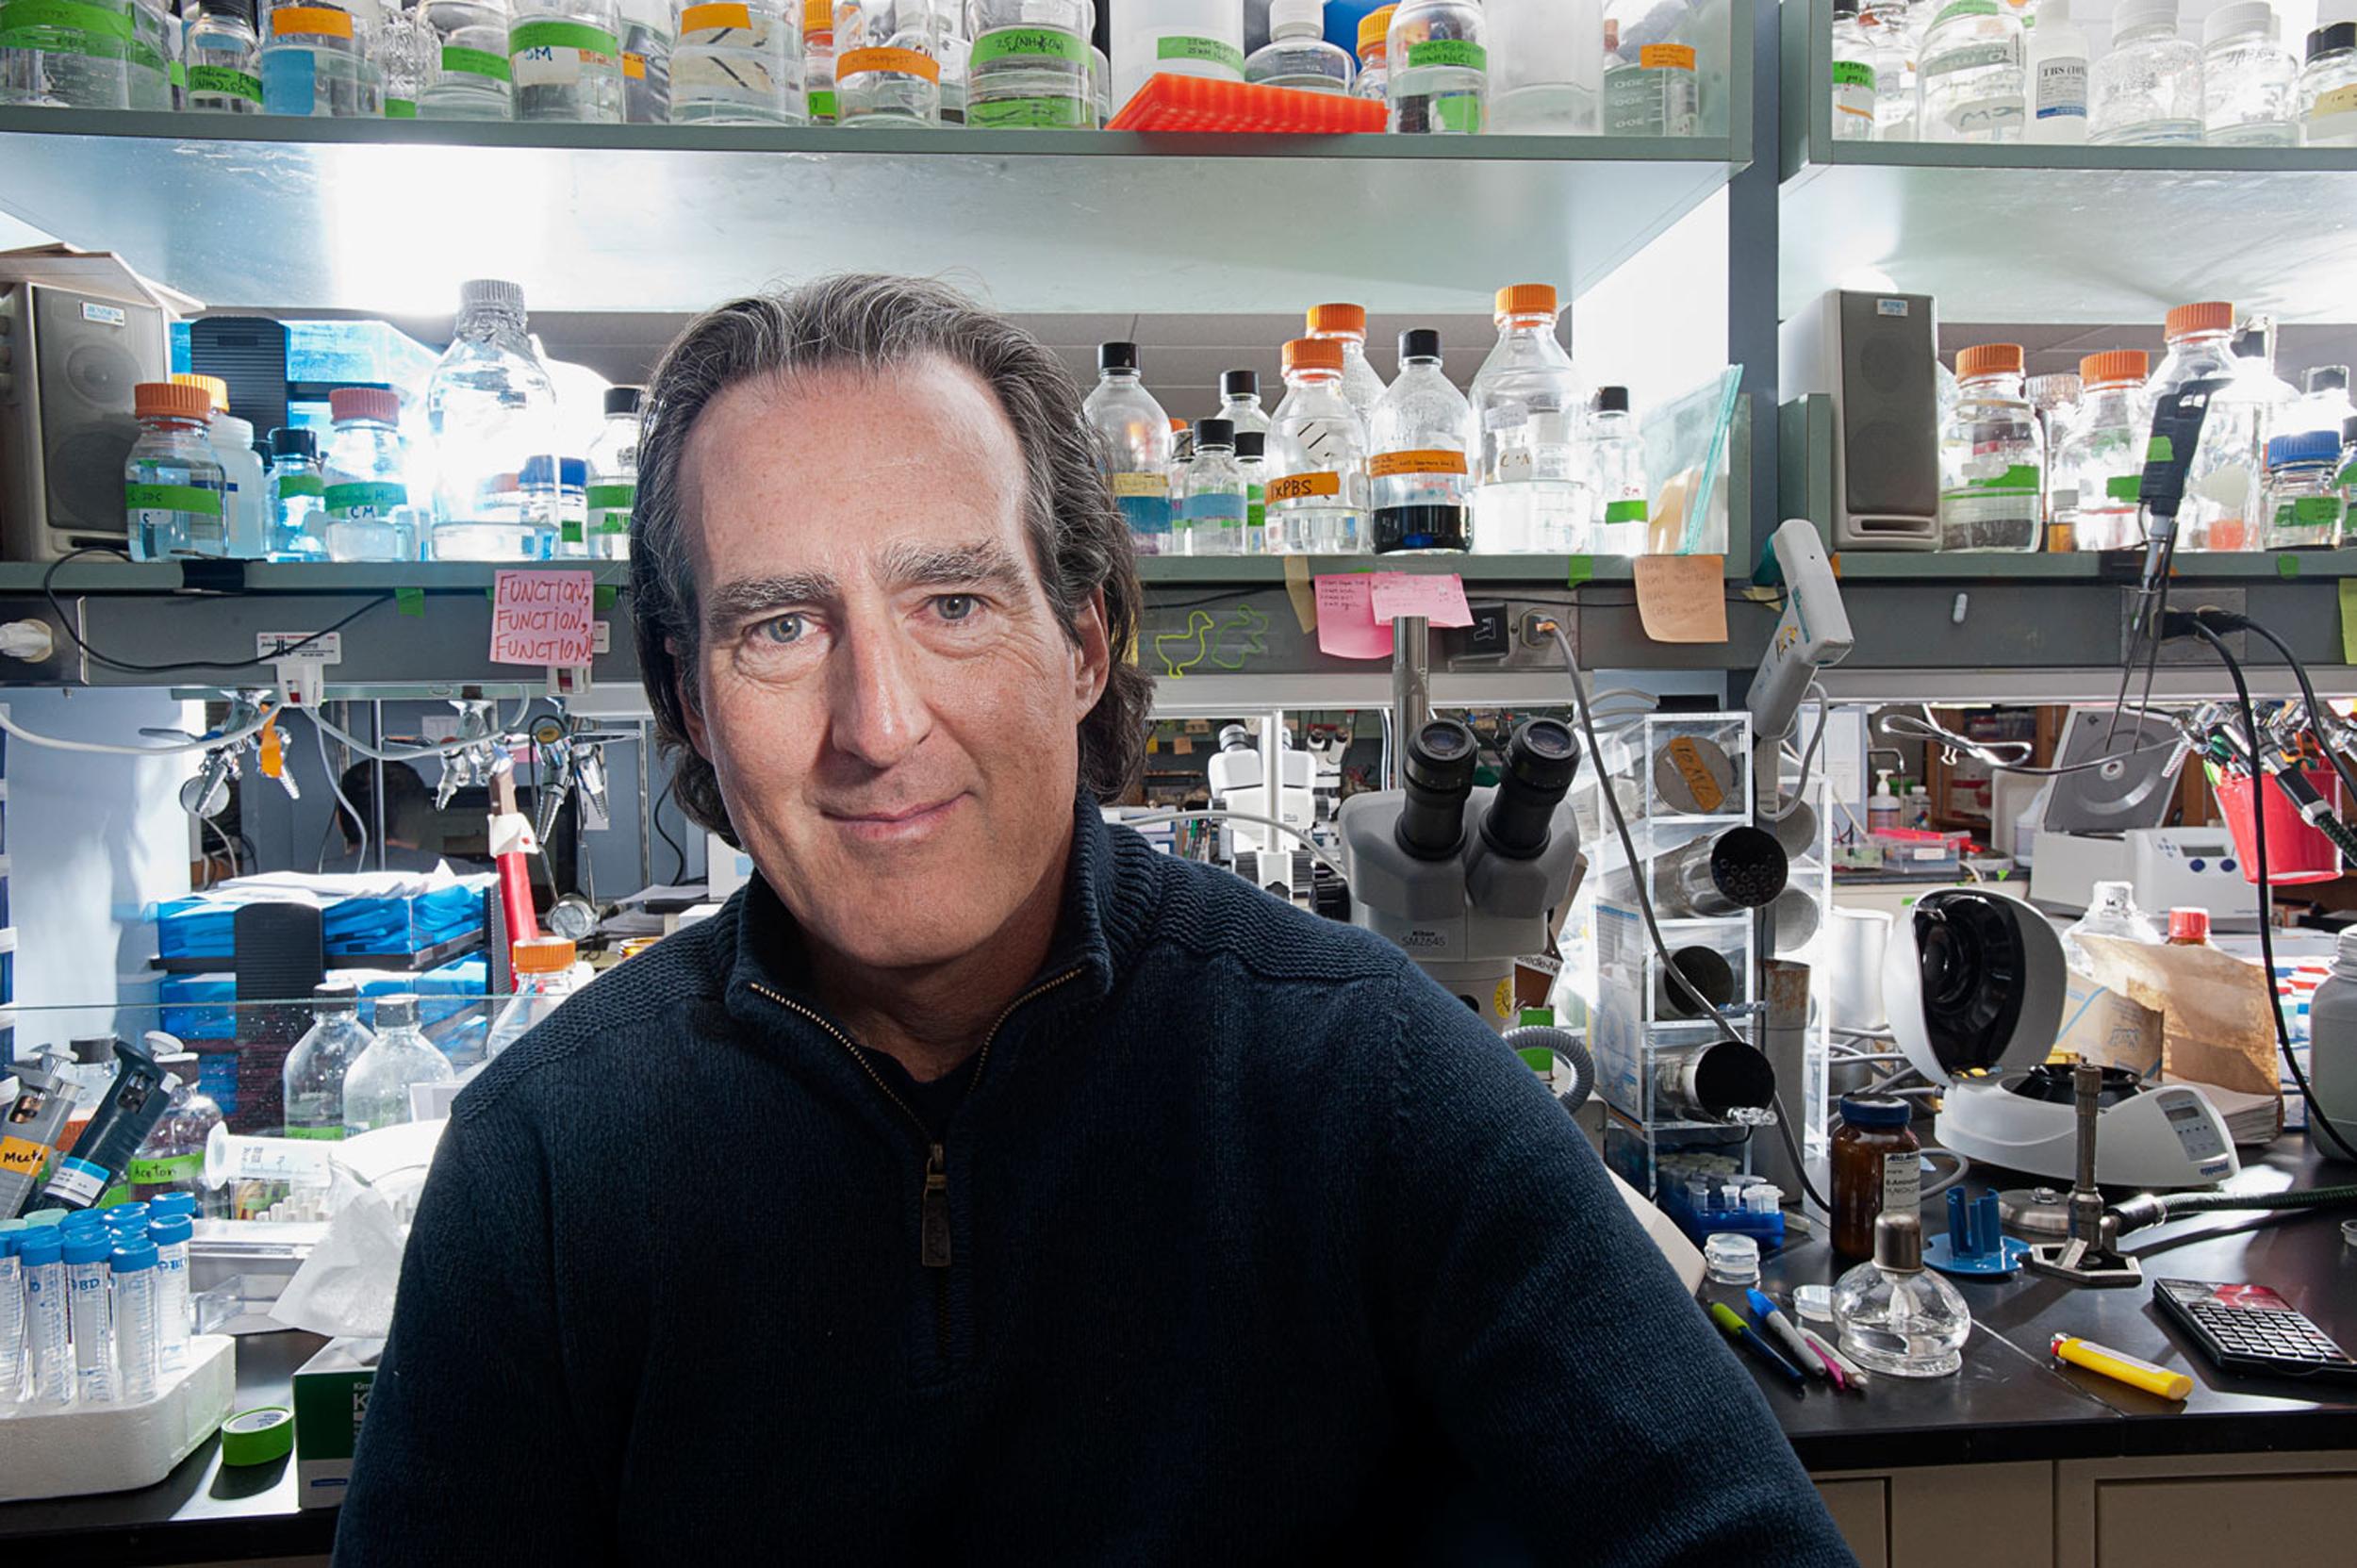 Craig Mello,Nobel Prize Winner